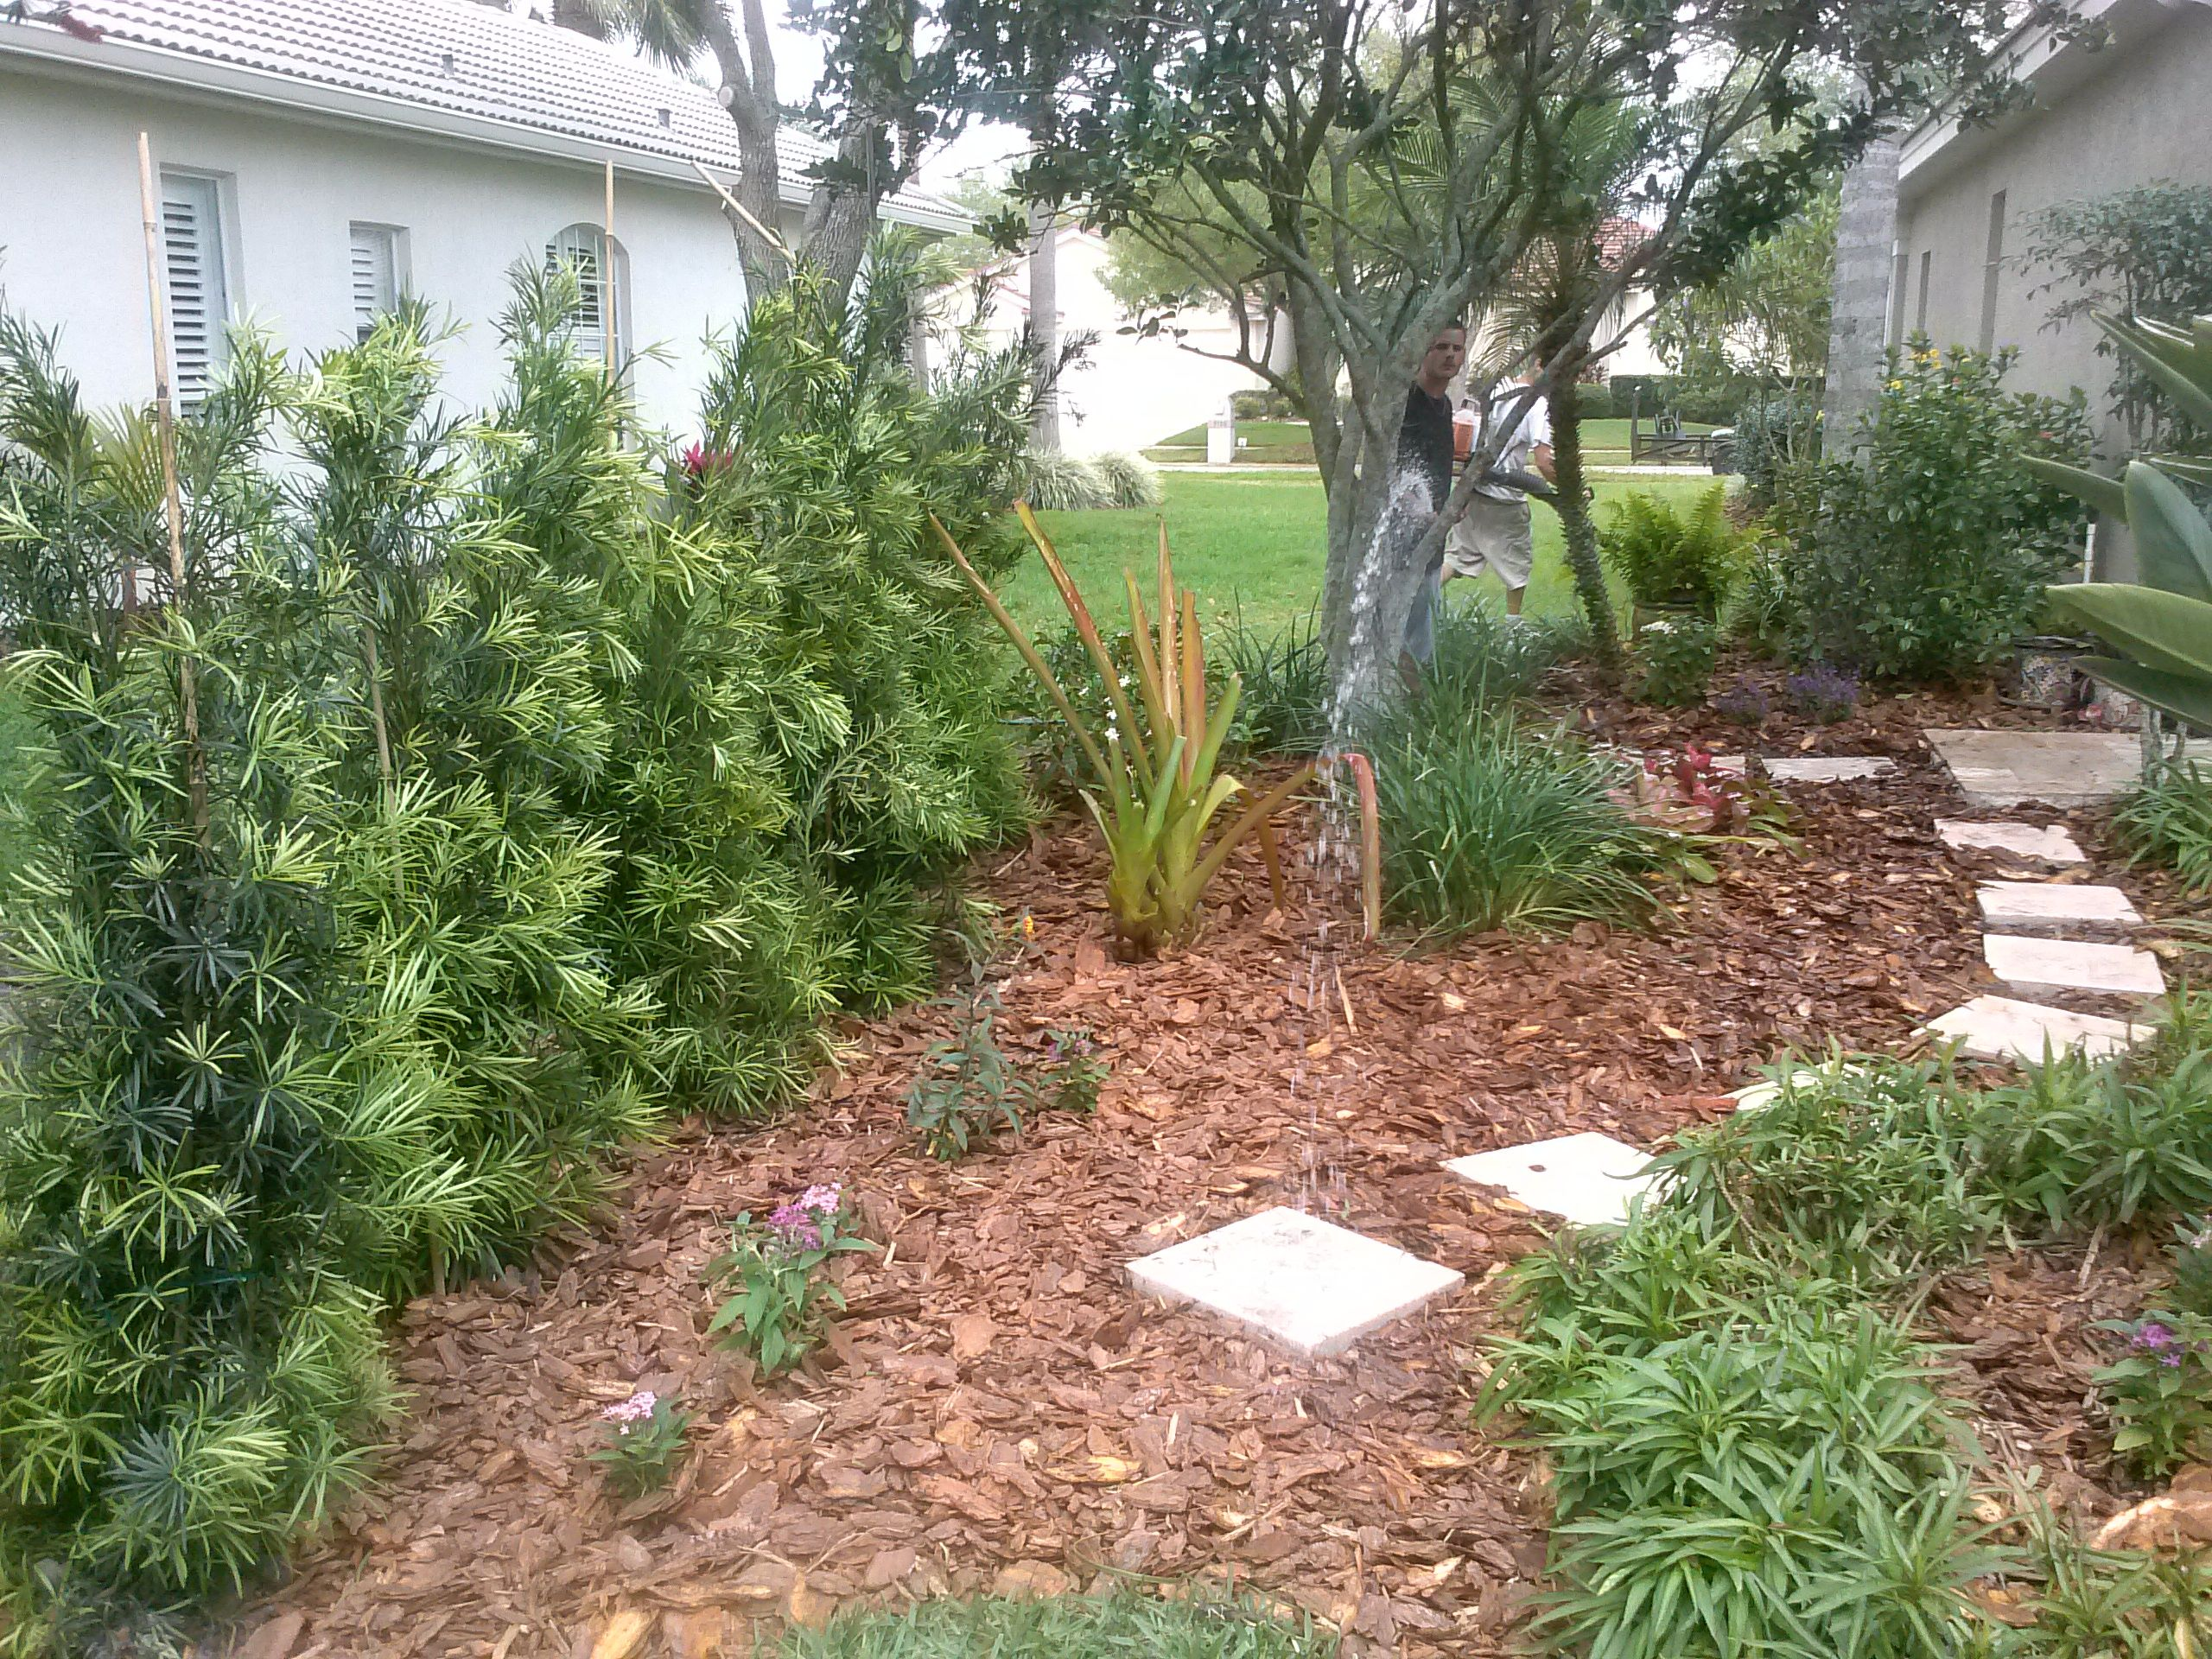 Podocarpus plants to create a pool privacy barrier | Privacy ...